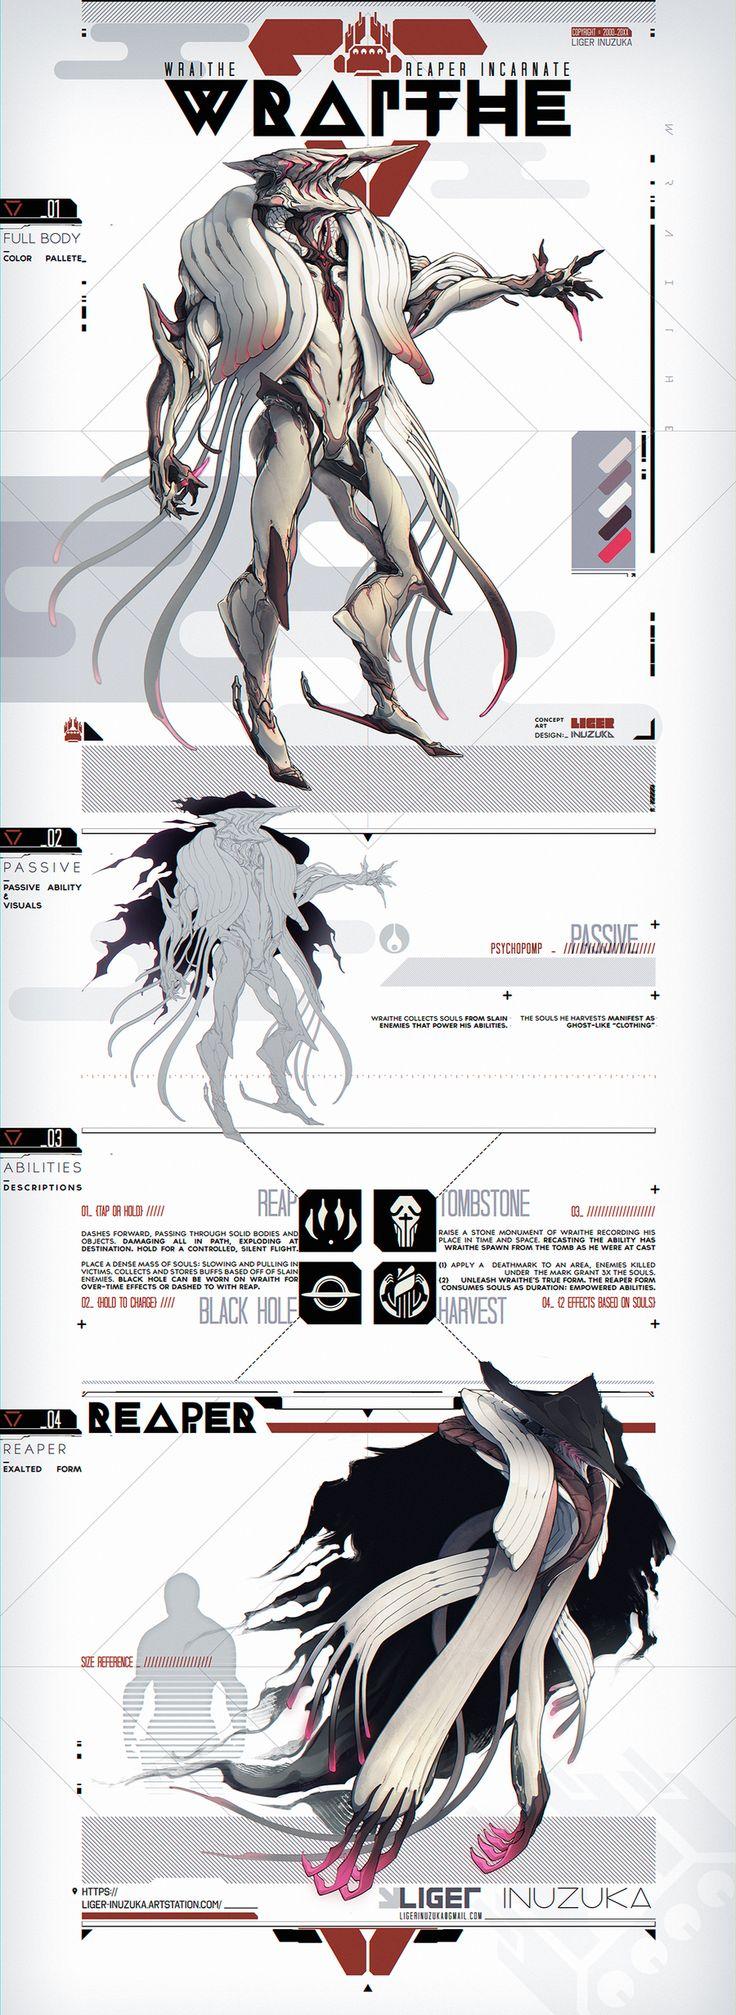 Warframe Concept Art: Wraithe the Reaper Incarnate by Liger-Inuzuka